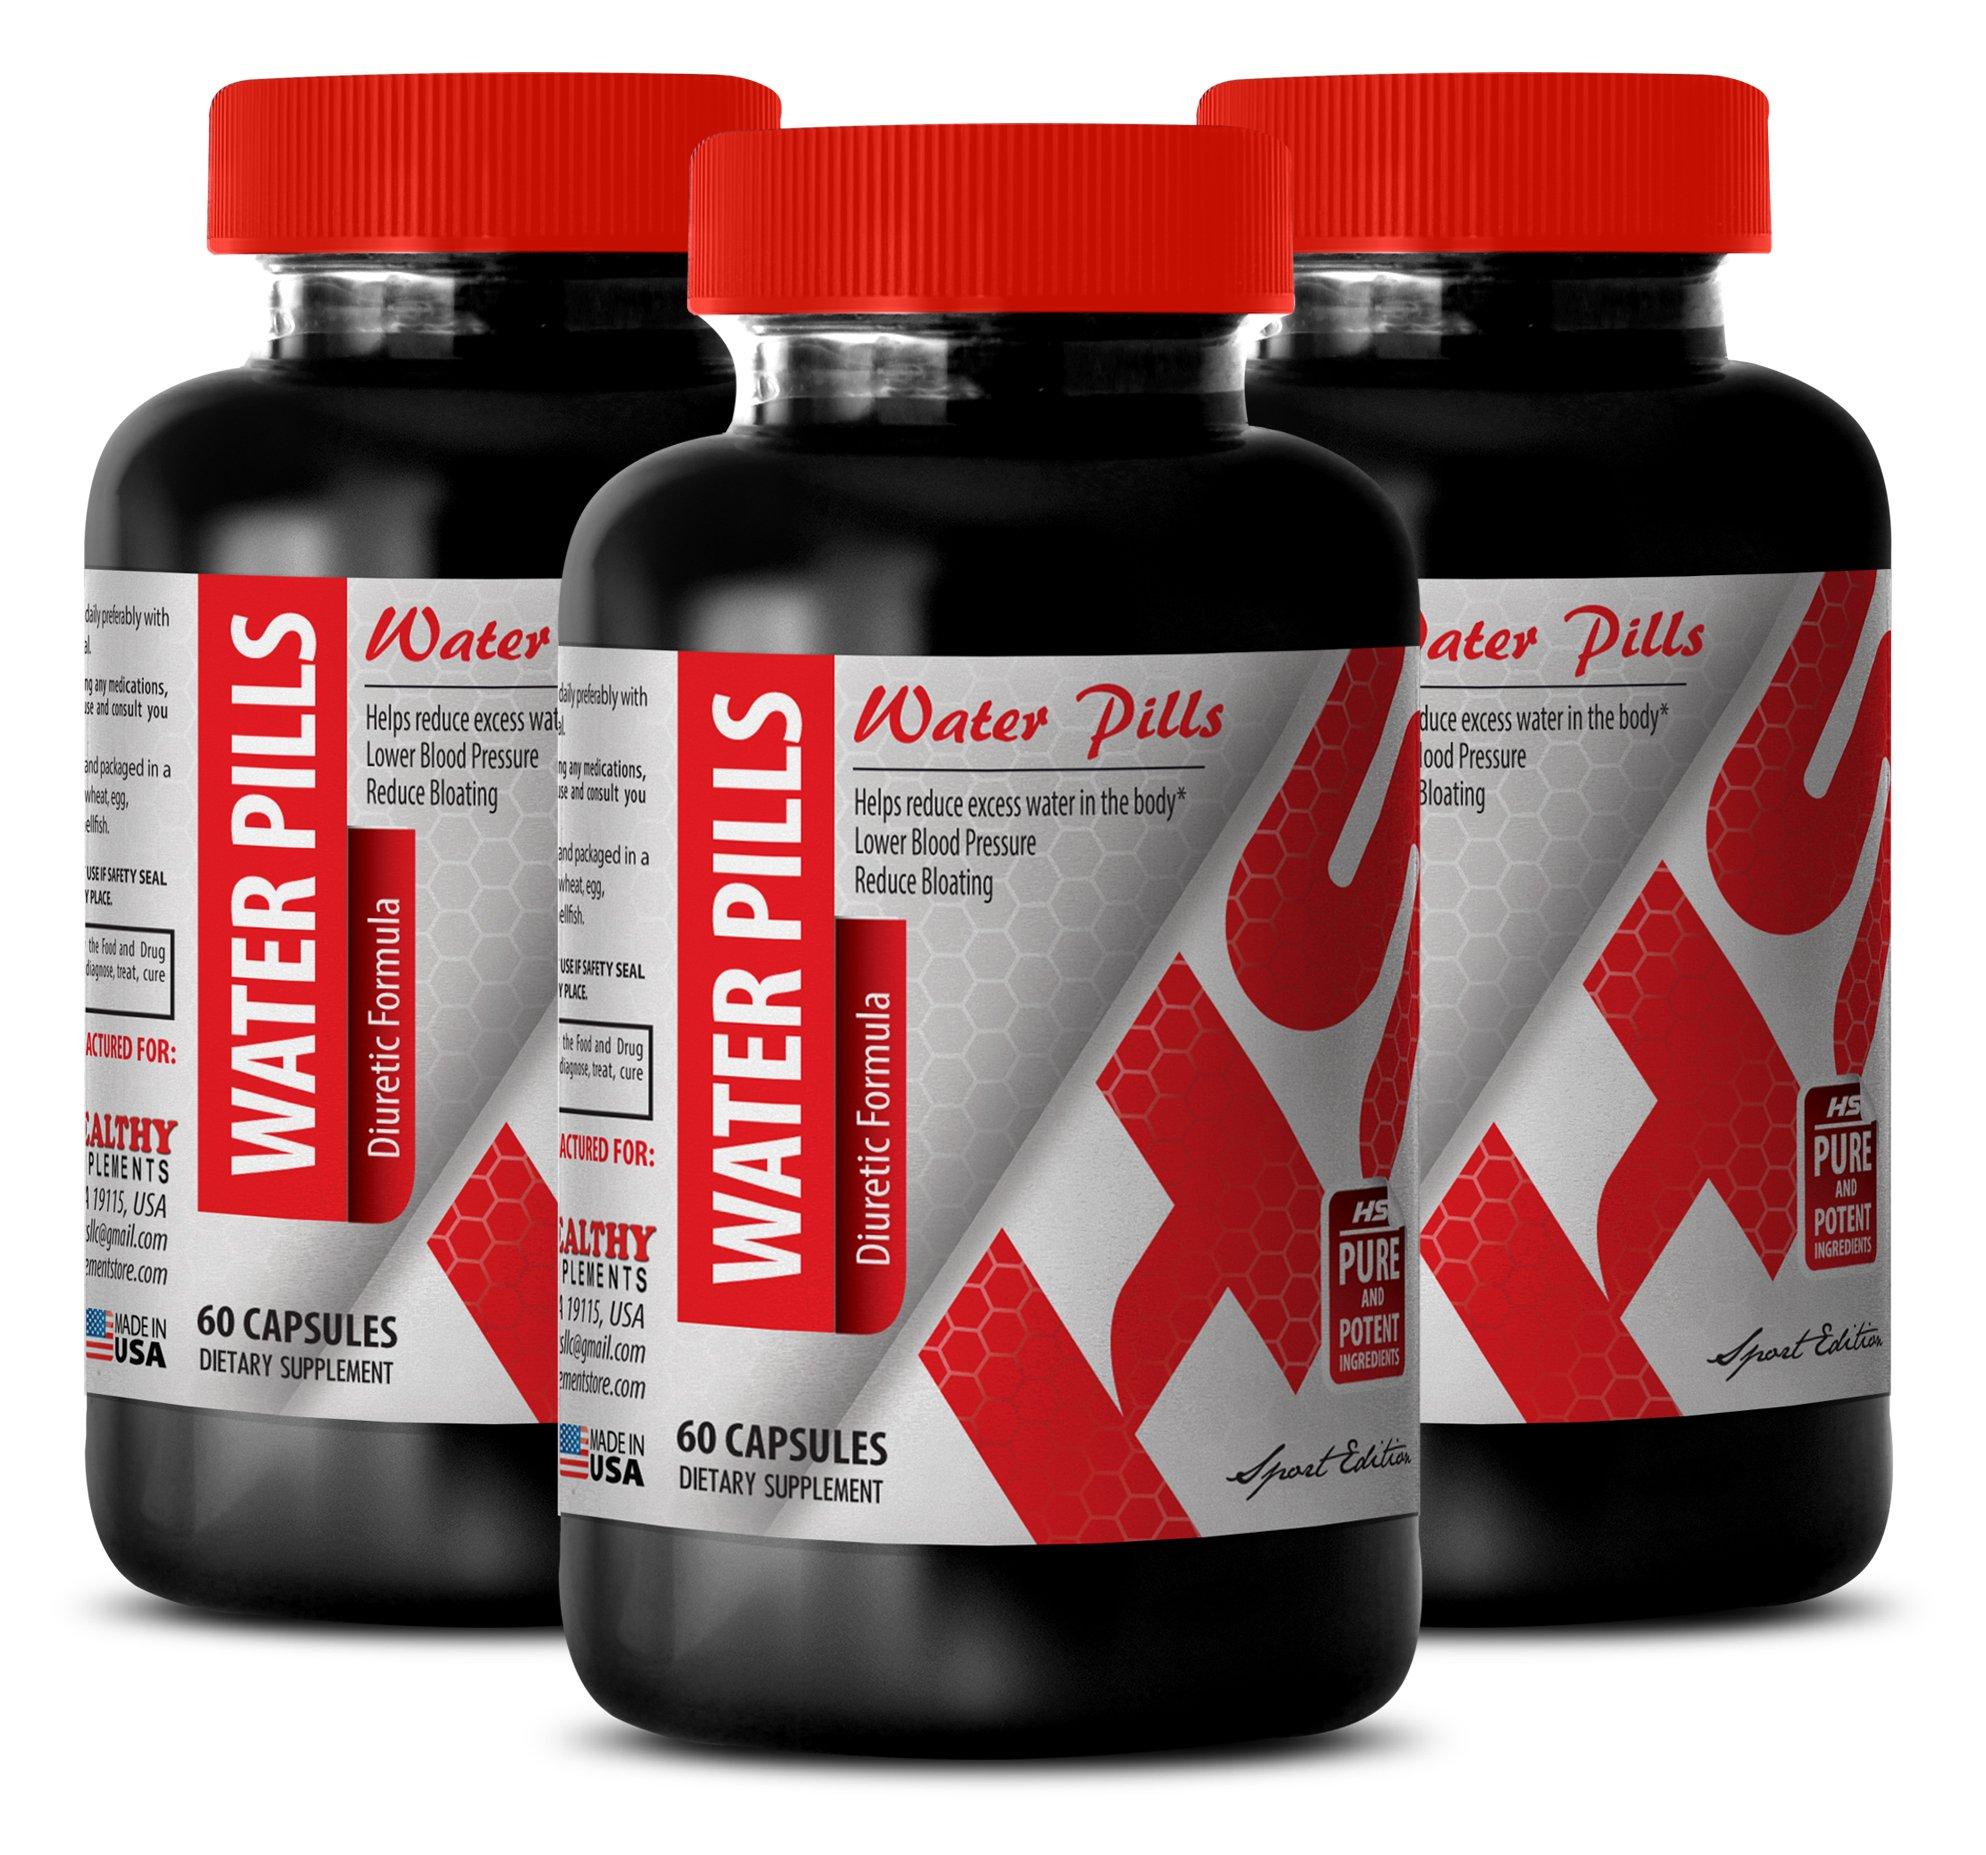 Apple cider vinegar organic capsules - WATER PILLS DIURETIC FORMULA - improve circulation (3 Bottles)